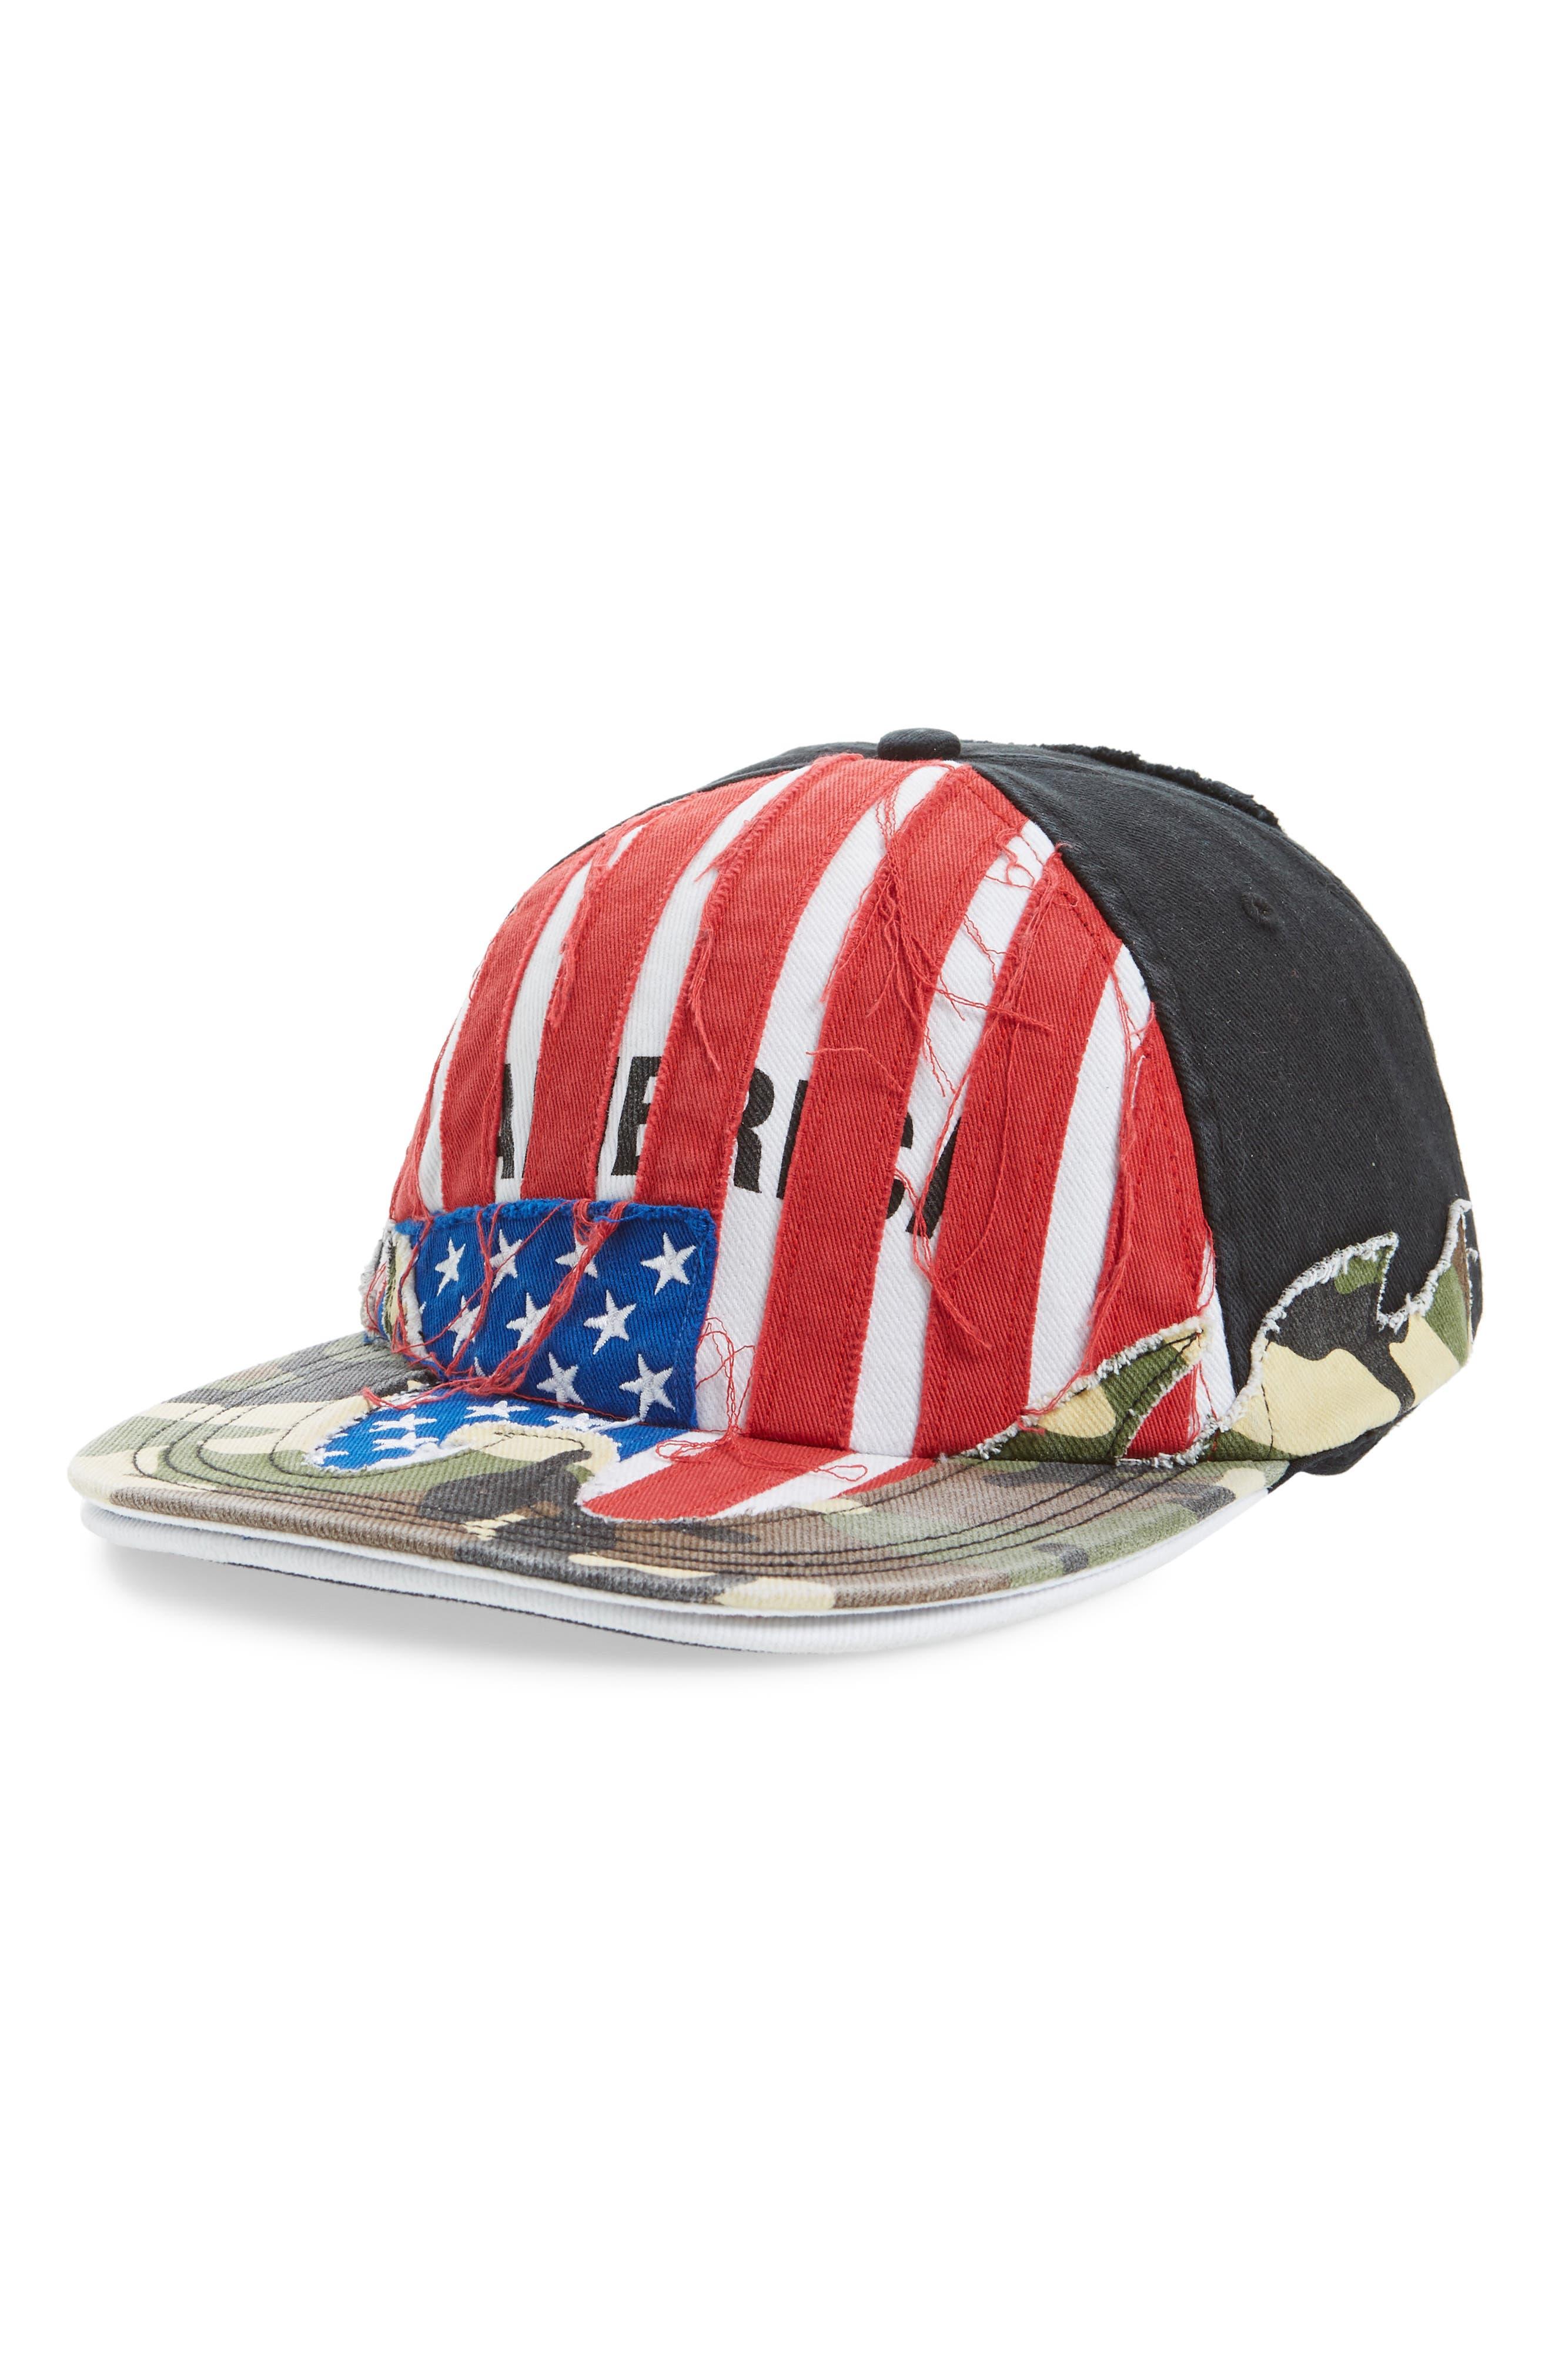 VETEMENTS, Cut Up America Baseball Cap, Main thumbnail 1, color, USA